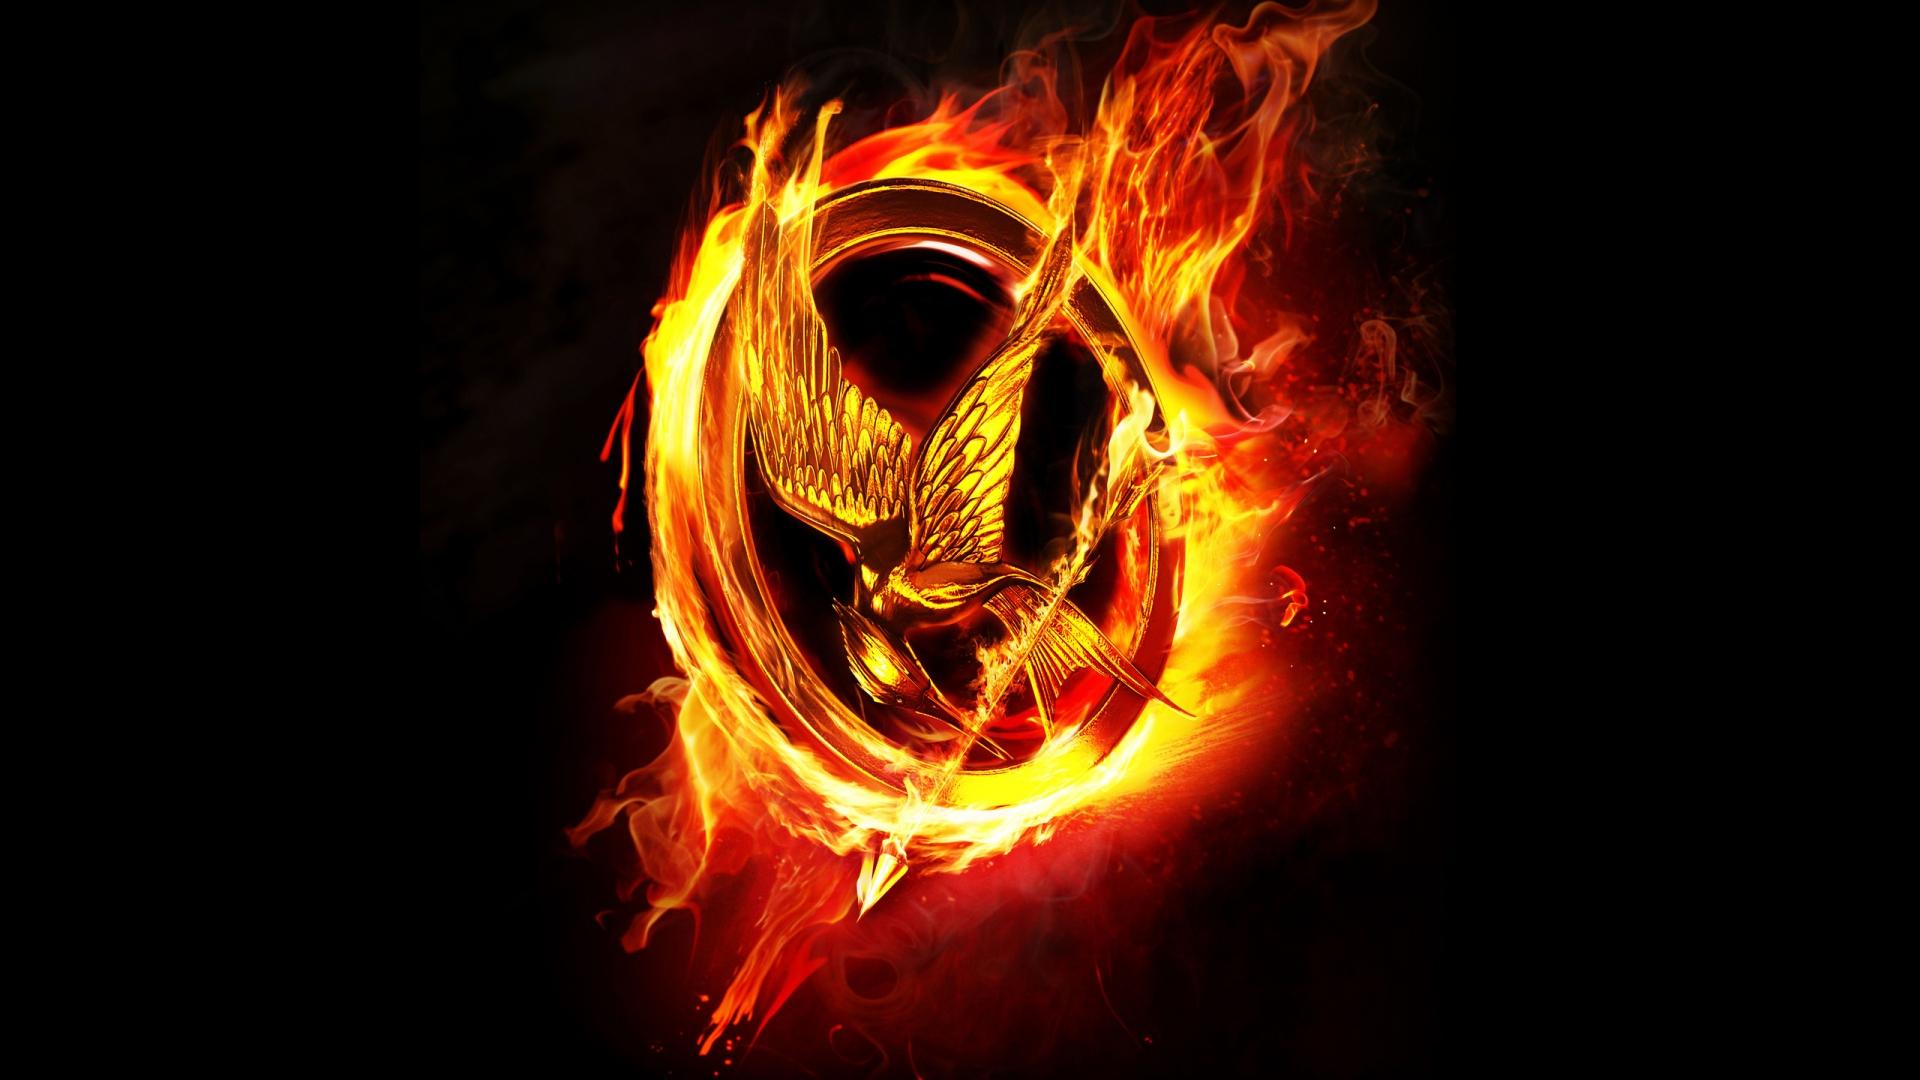 Image - The-hunger-games-logo-hd-mobile-751968.jpg - The Hunger Games ... Sad Keanu 3d Print